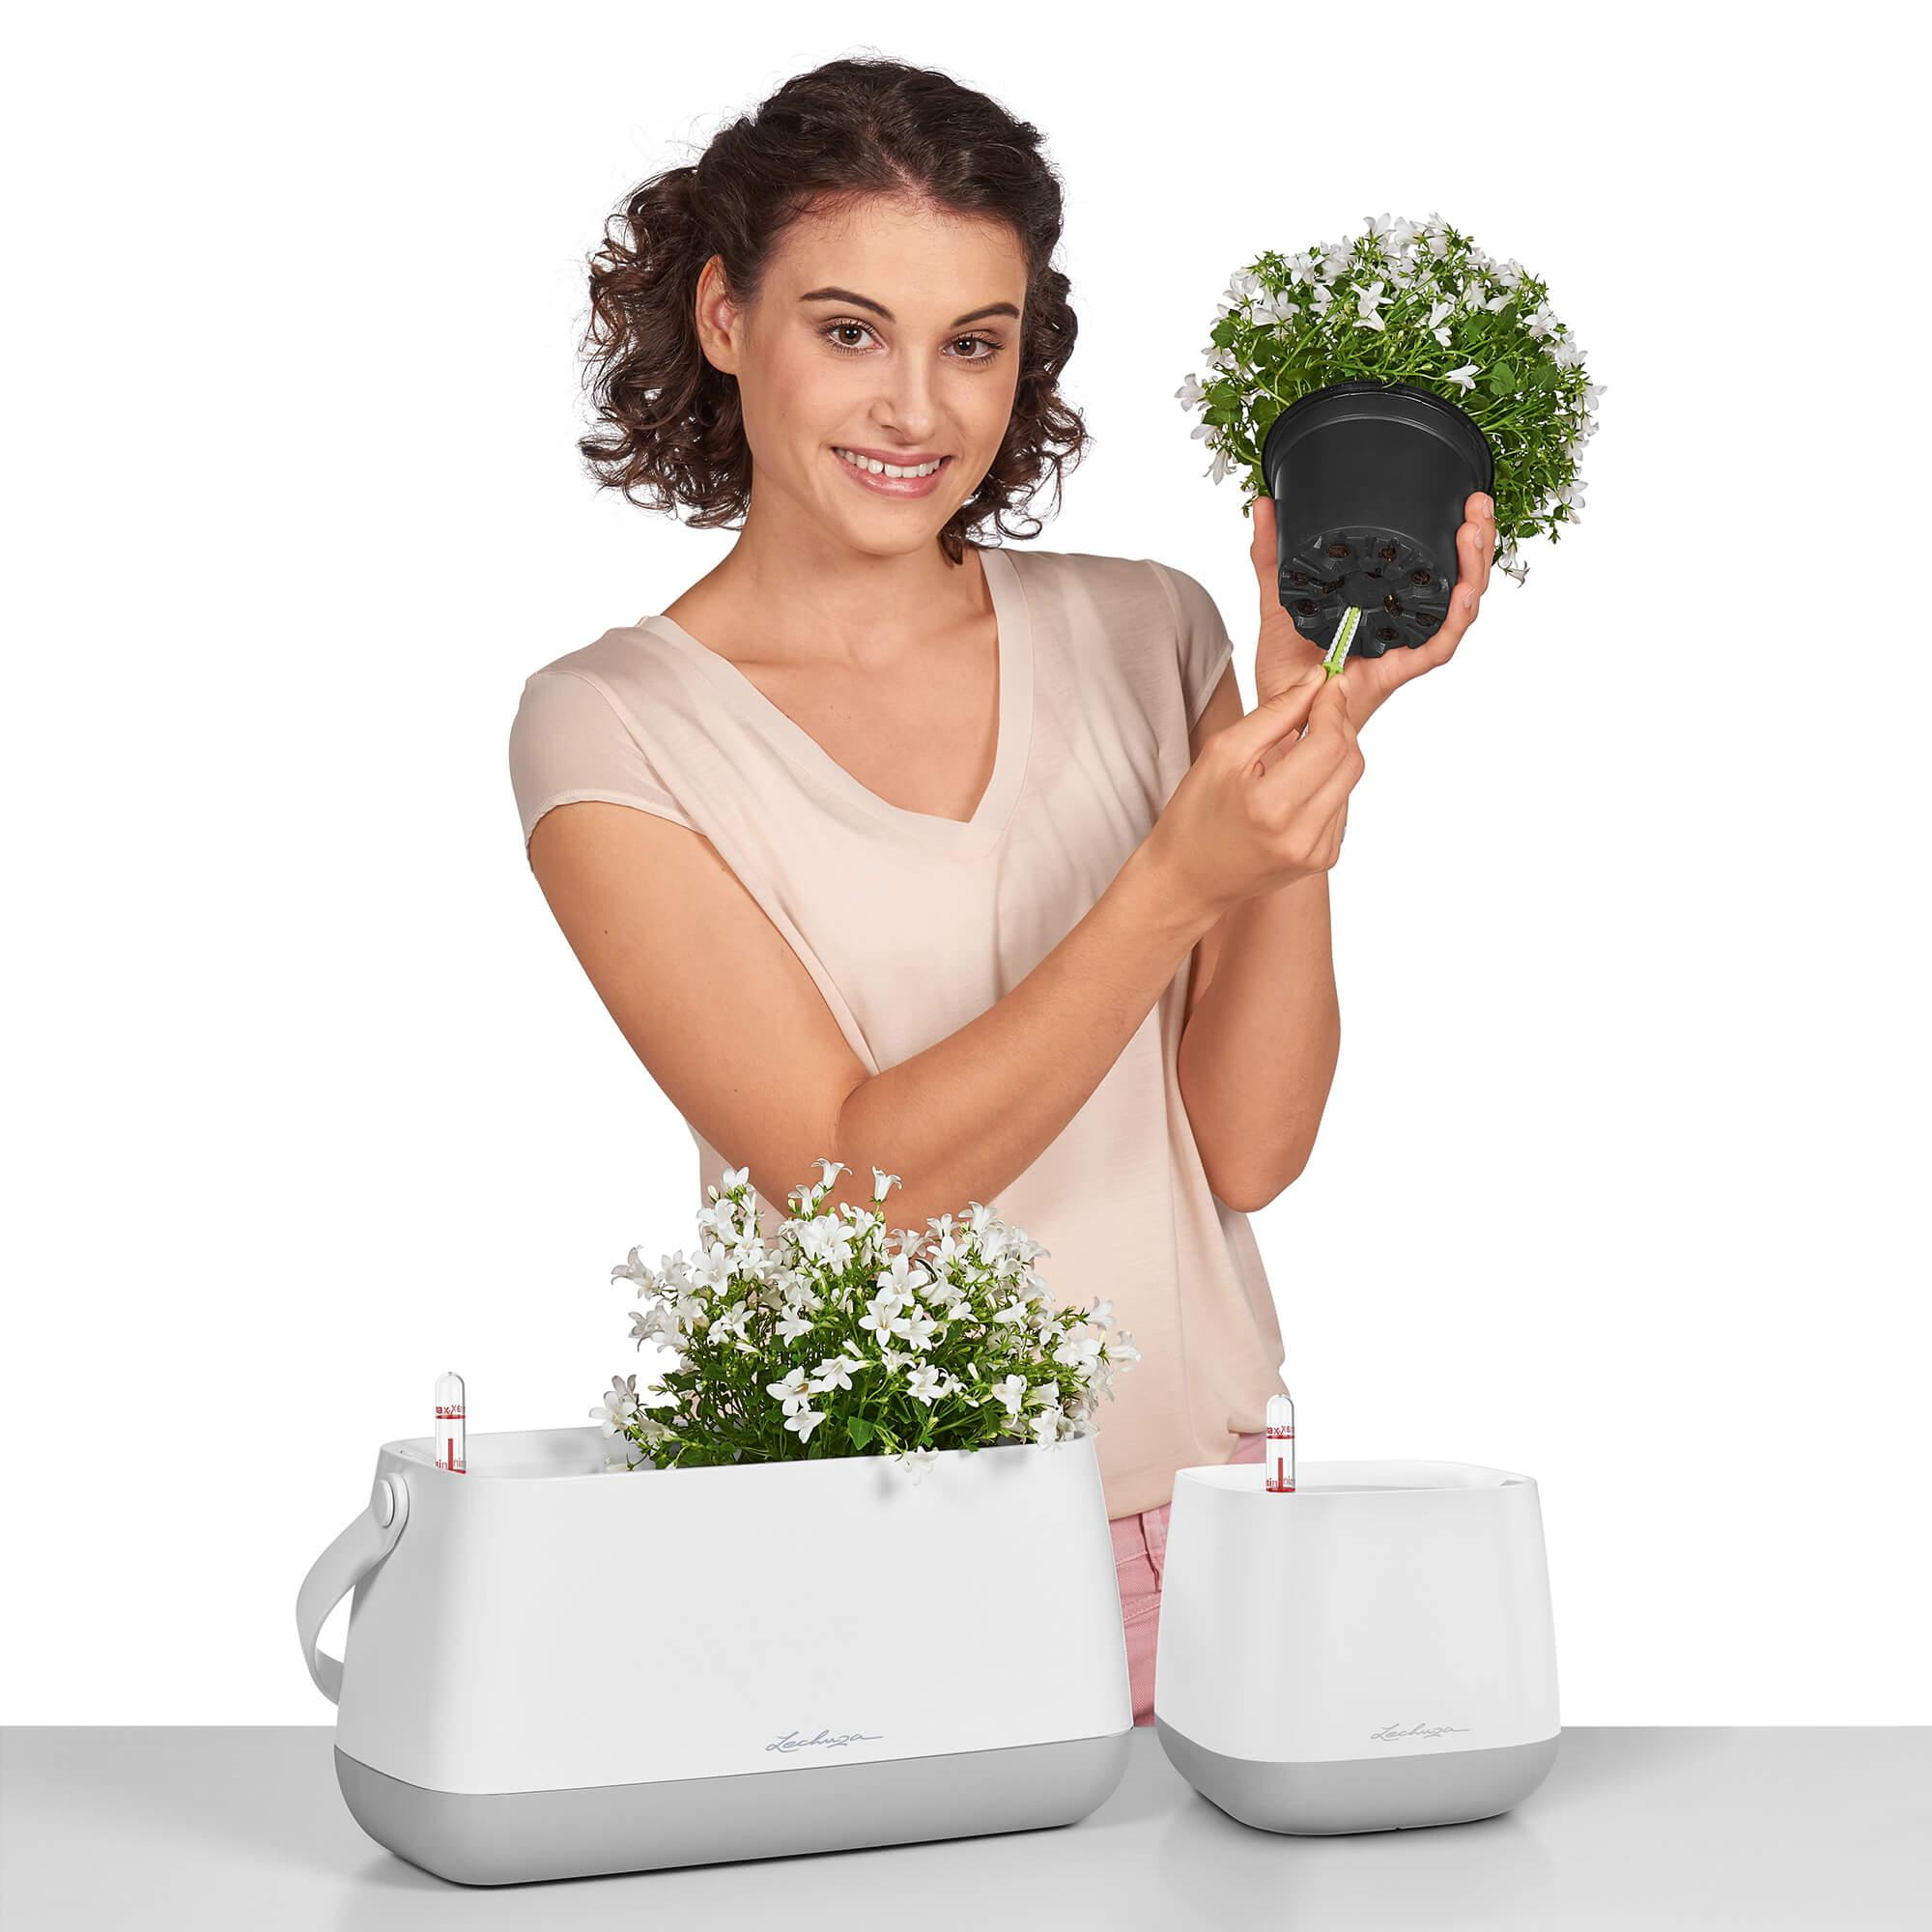 YULA planter white/gray semi-gloss - Image 4